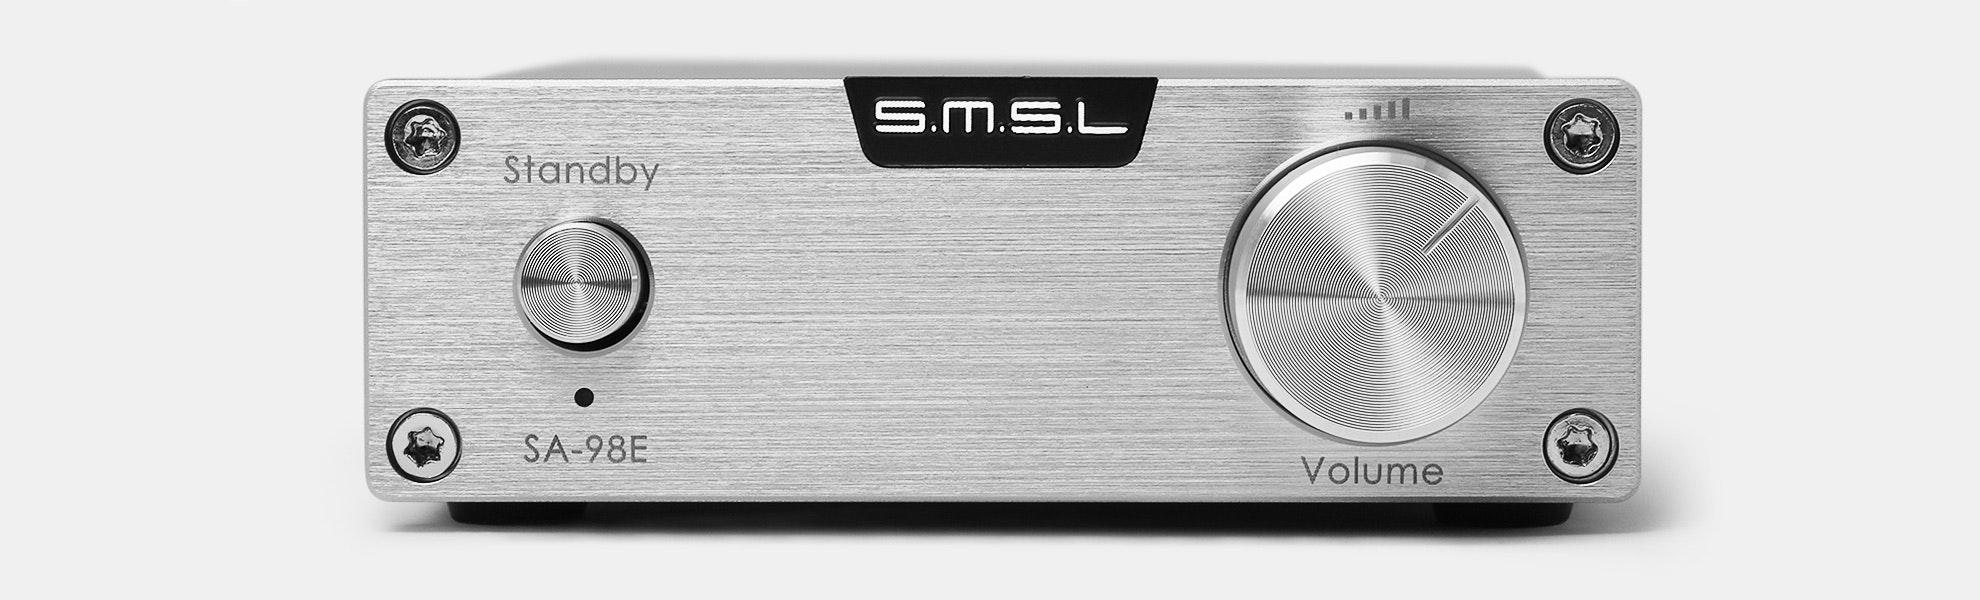 SMSL SA-98E Stereo Amplifier